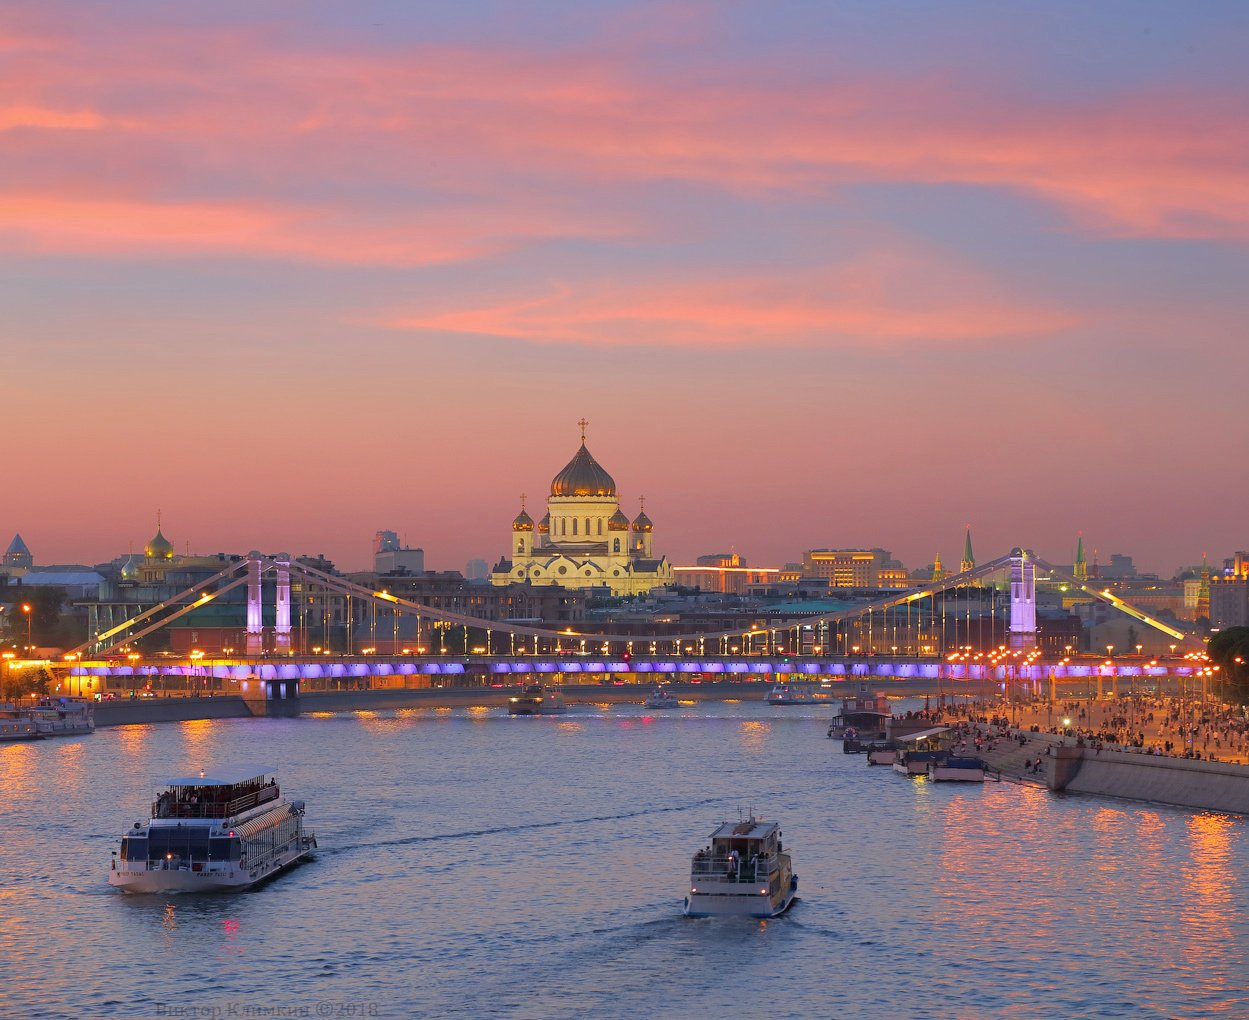 москва, вечер, закат, река, крымский мост, храм, христа спасителя, Виктор Климкин